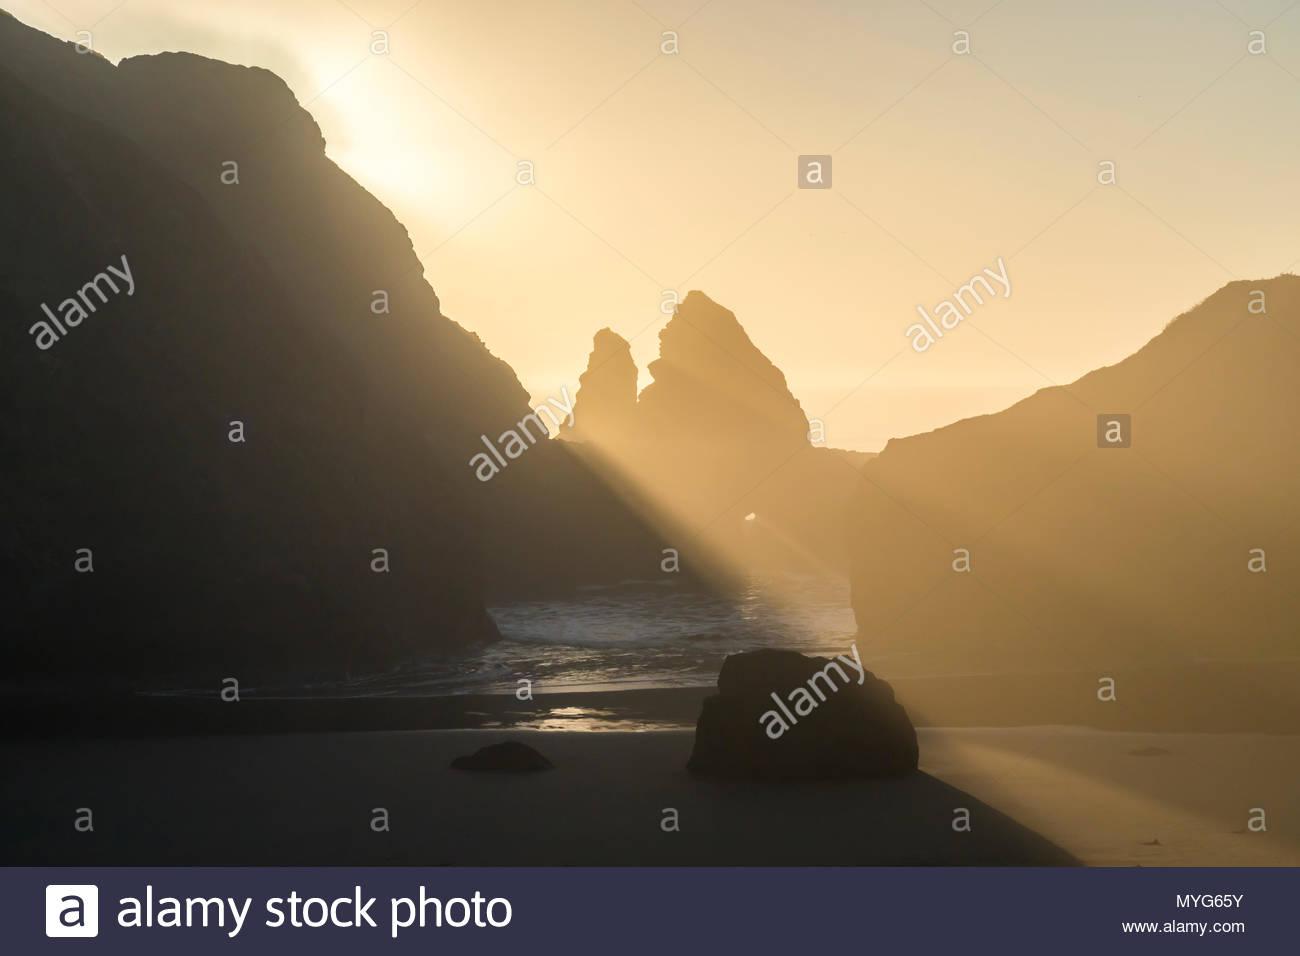 Sisters Rocks State Park, Oregon, Pacific Ocean coastline, seaside - Stock Image